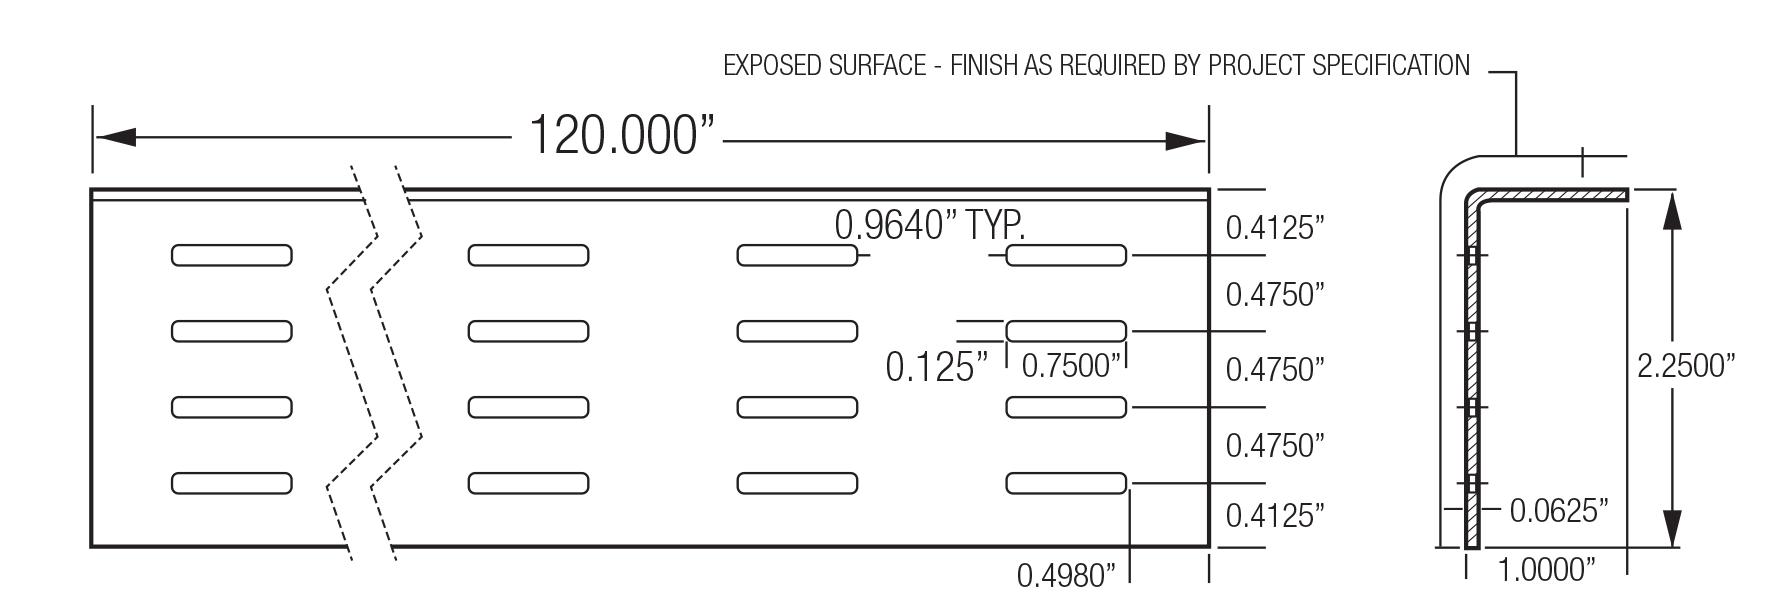 "Monarch Metal Cladding & Rain Screen System - 210-001 2.25"" Vent Screen"